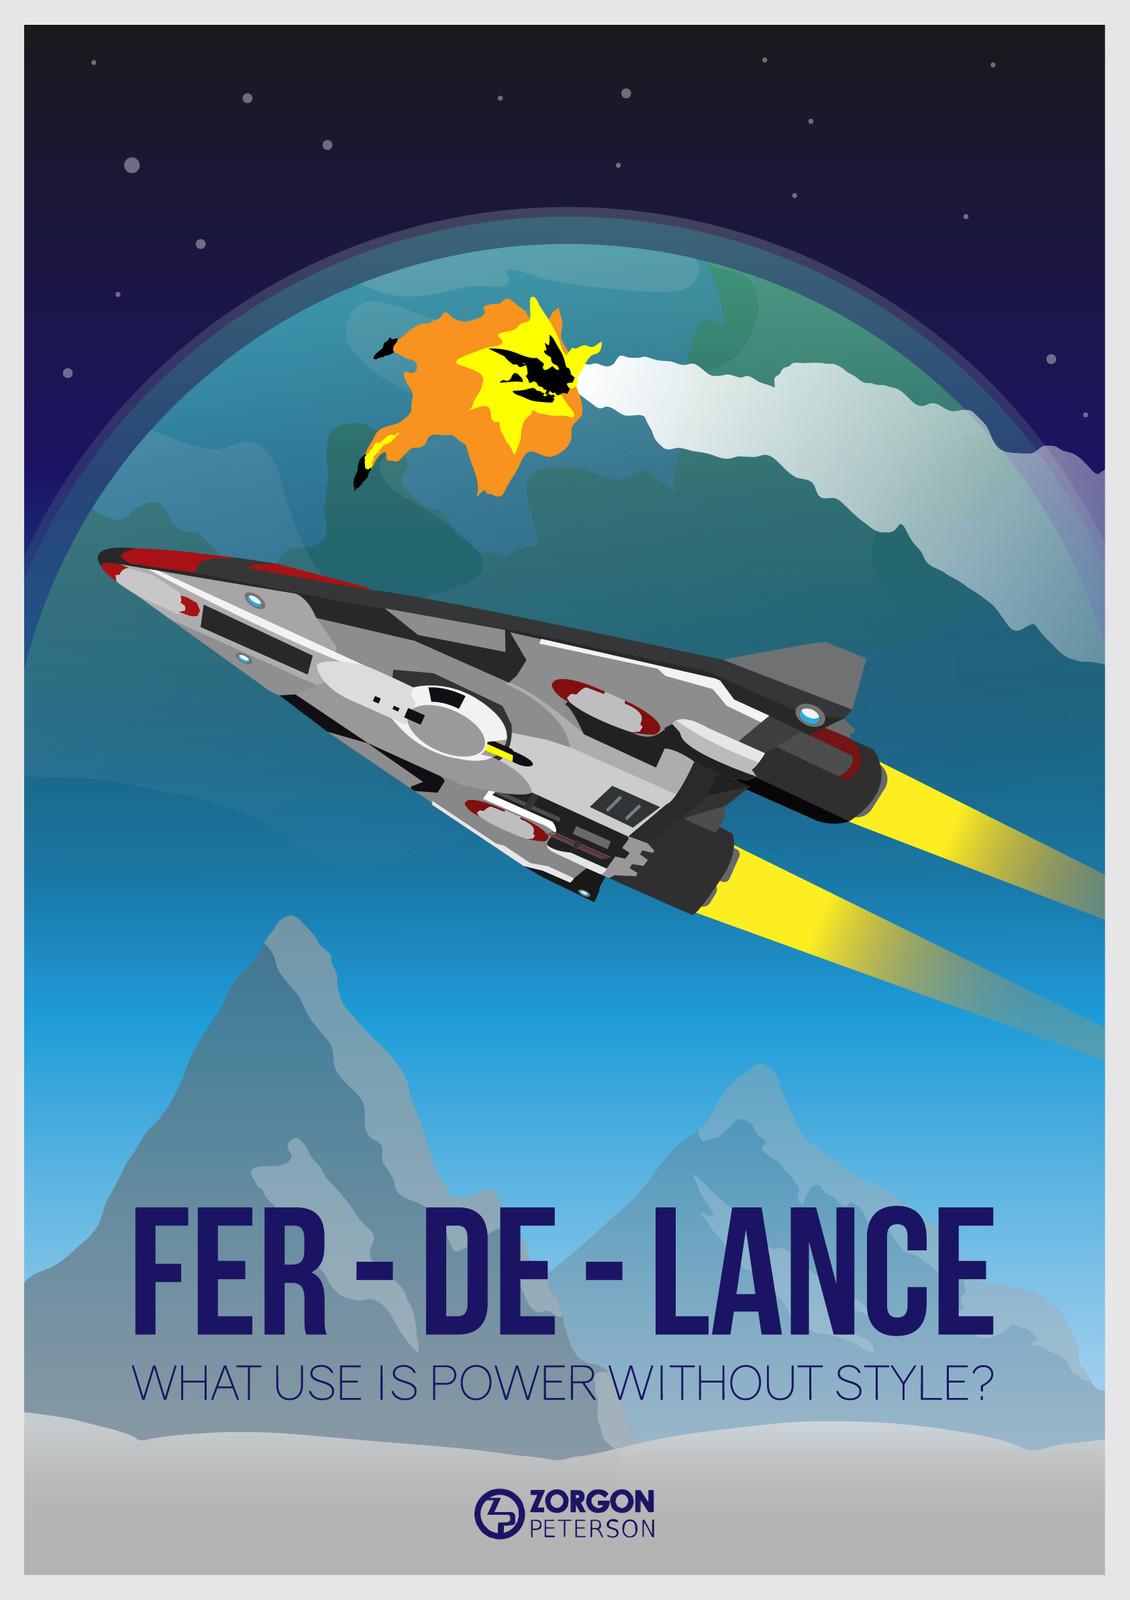 Elite Dangerous - Fer-De-Lance Poster